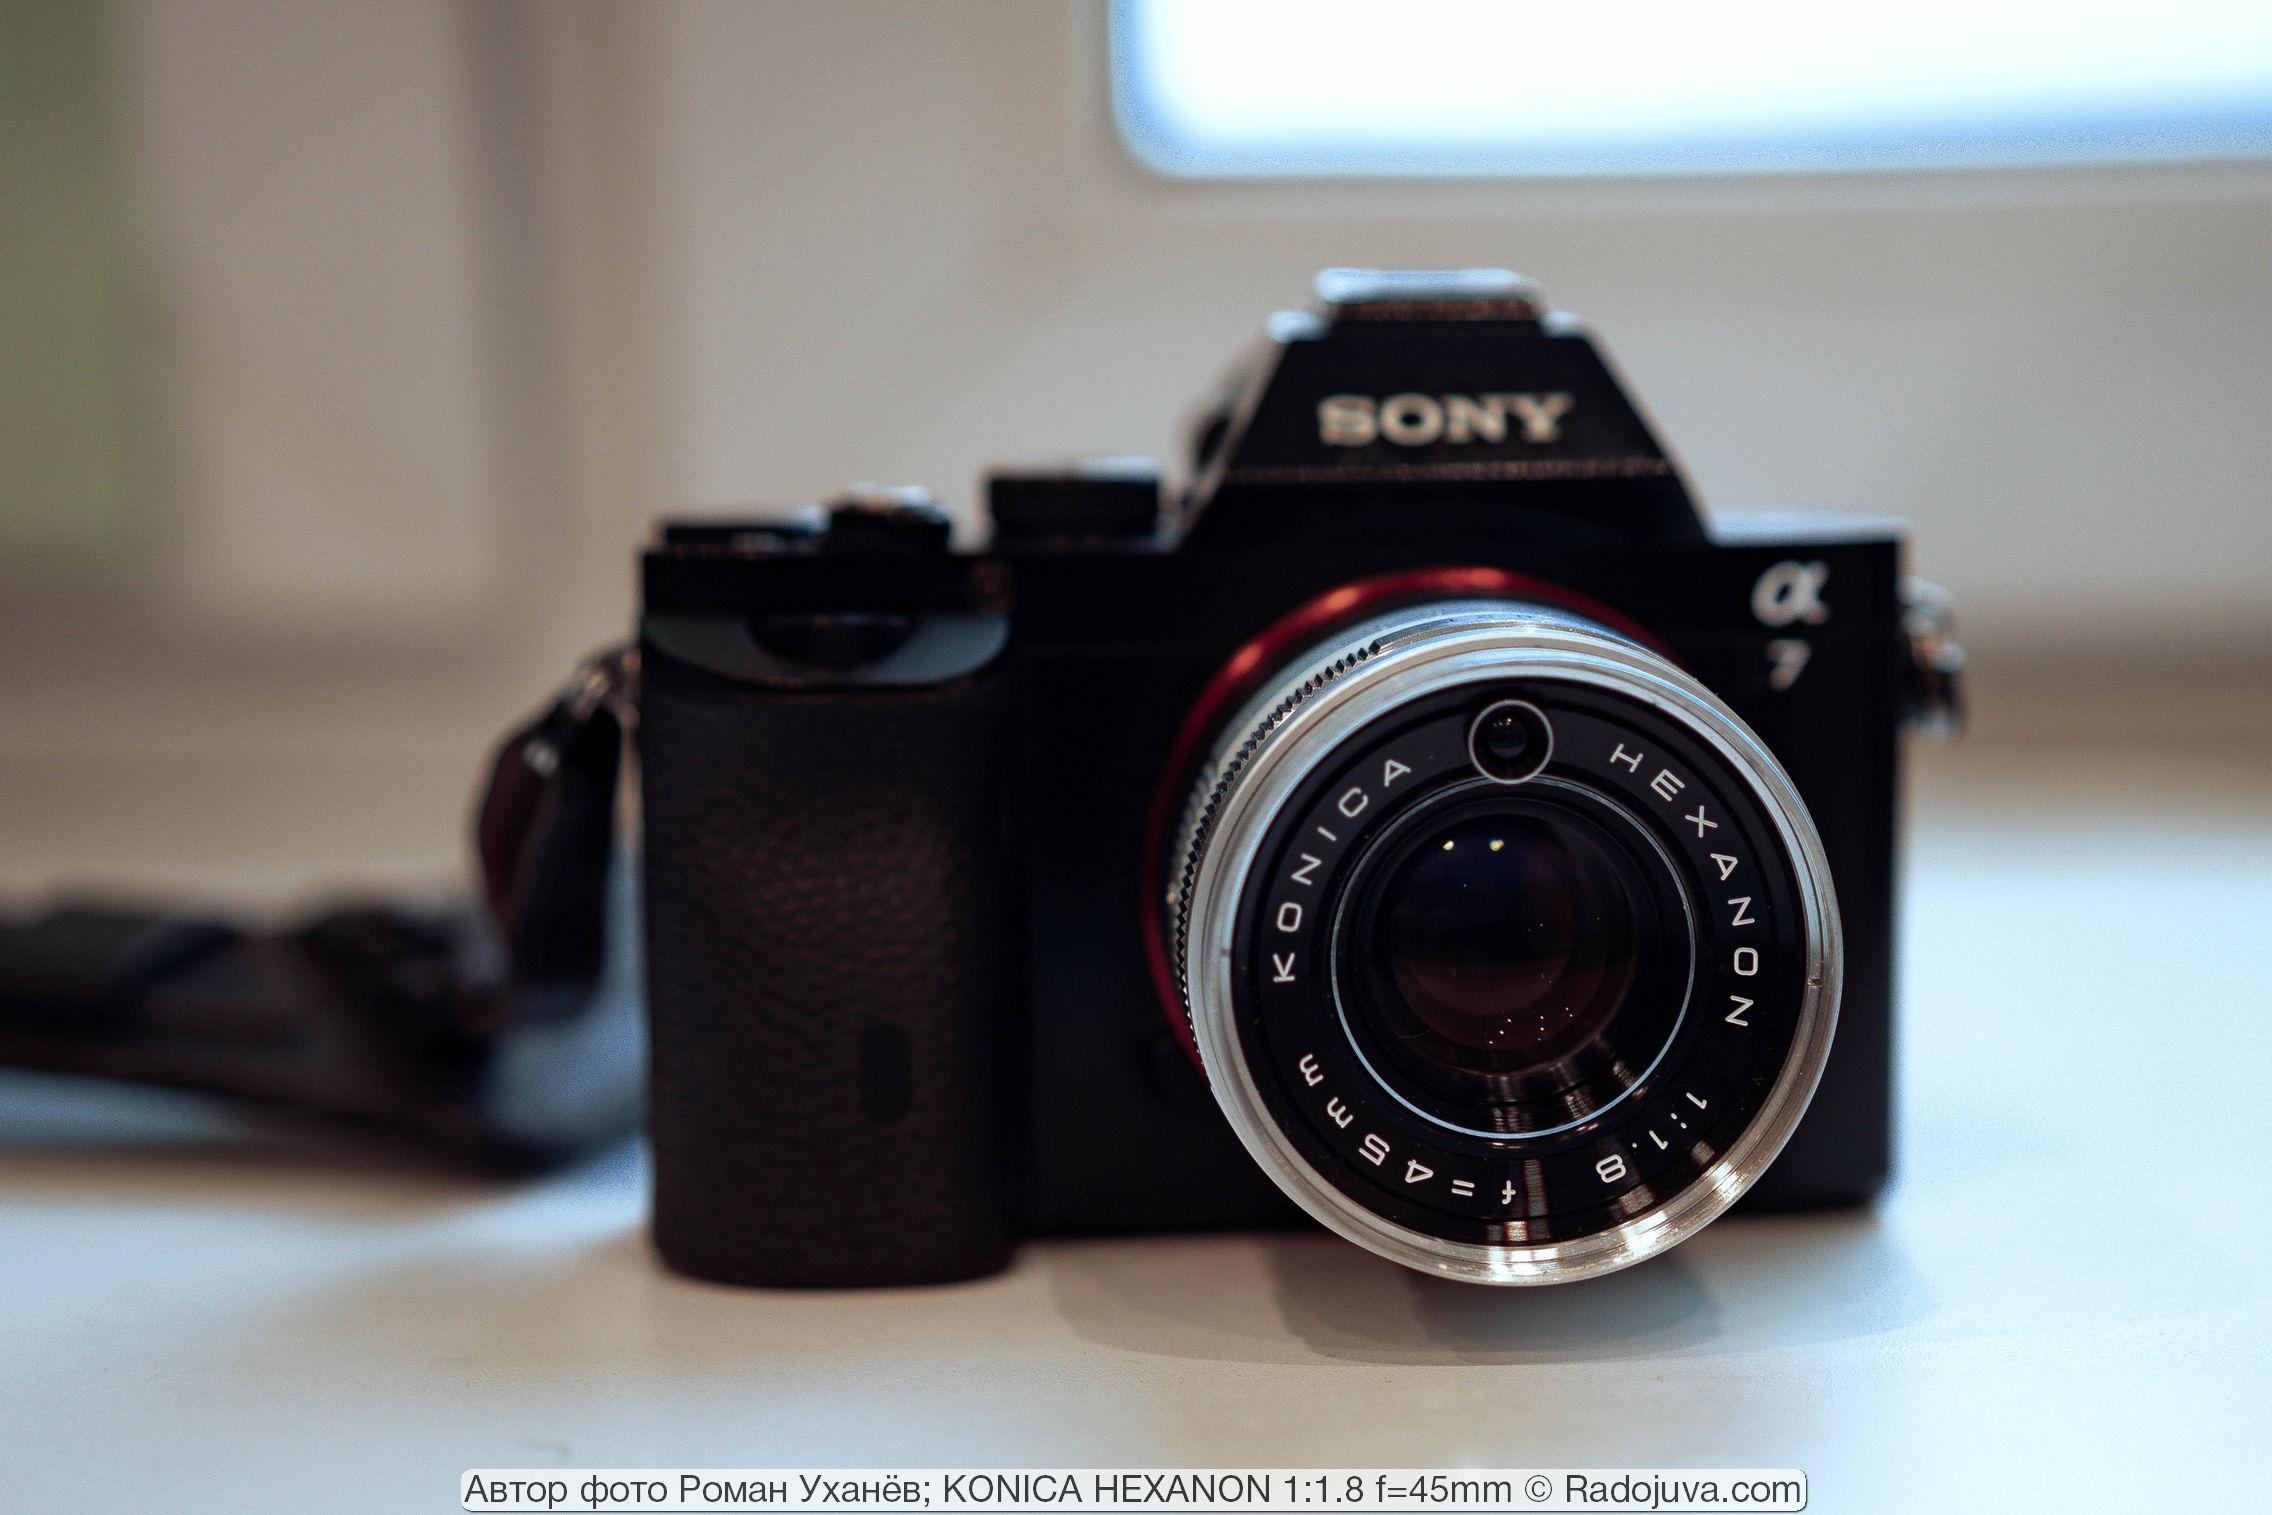 KONICA HEXANON 1:1.8 f=45mm. Обзор от читателя Радоживы